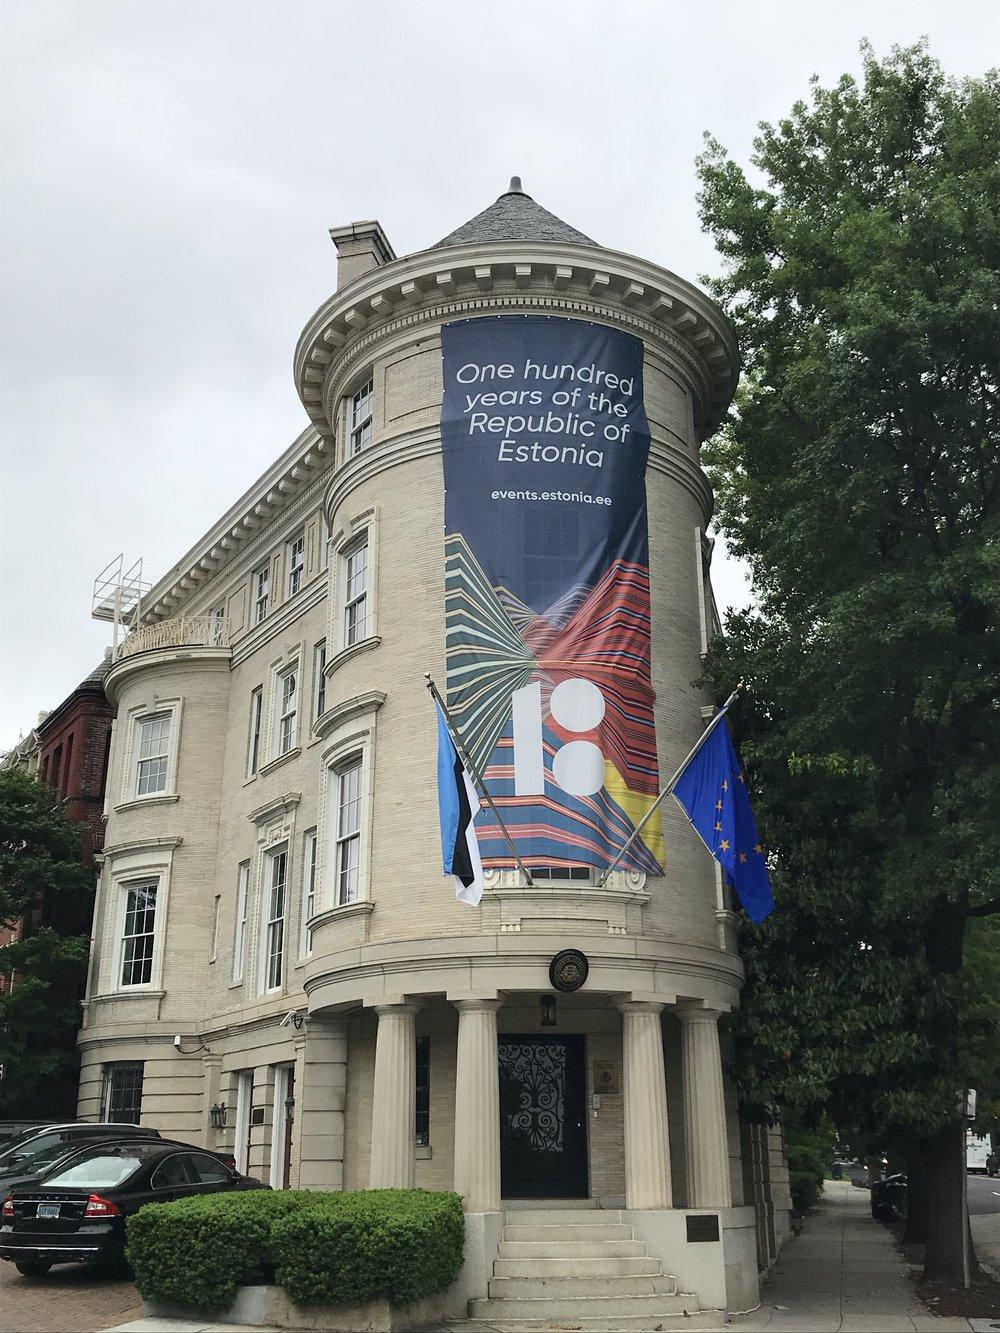 The Embassy of Estonia.